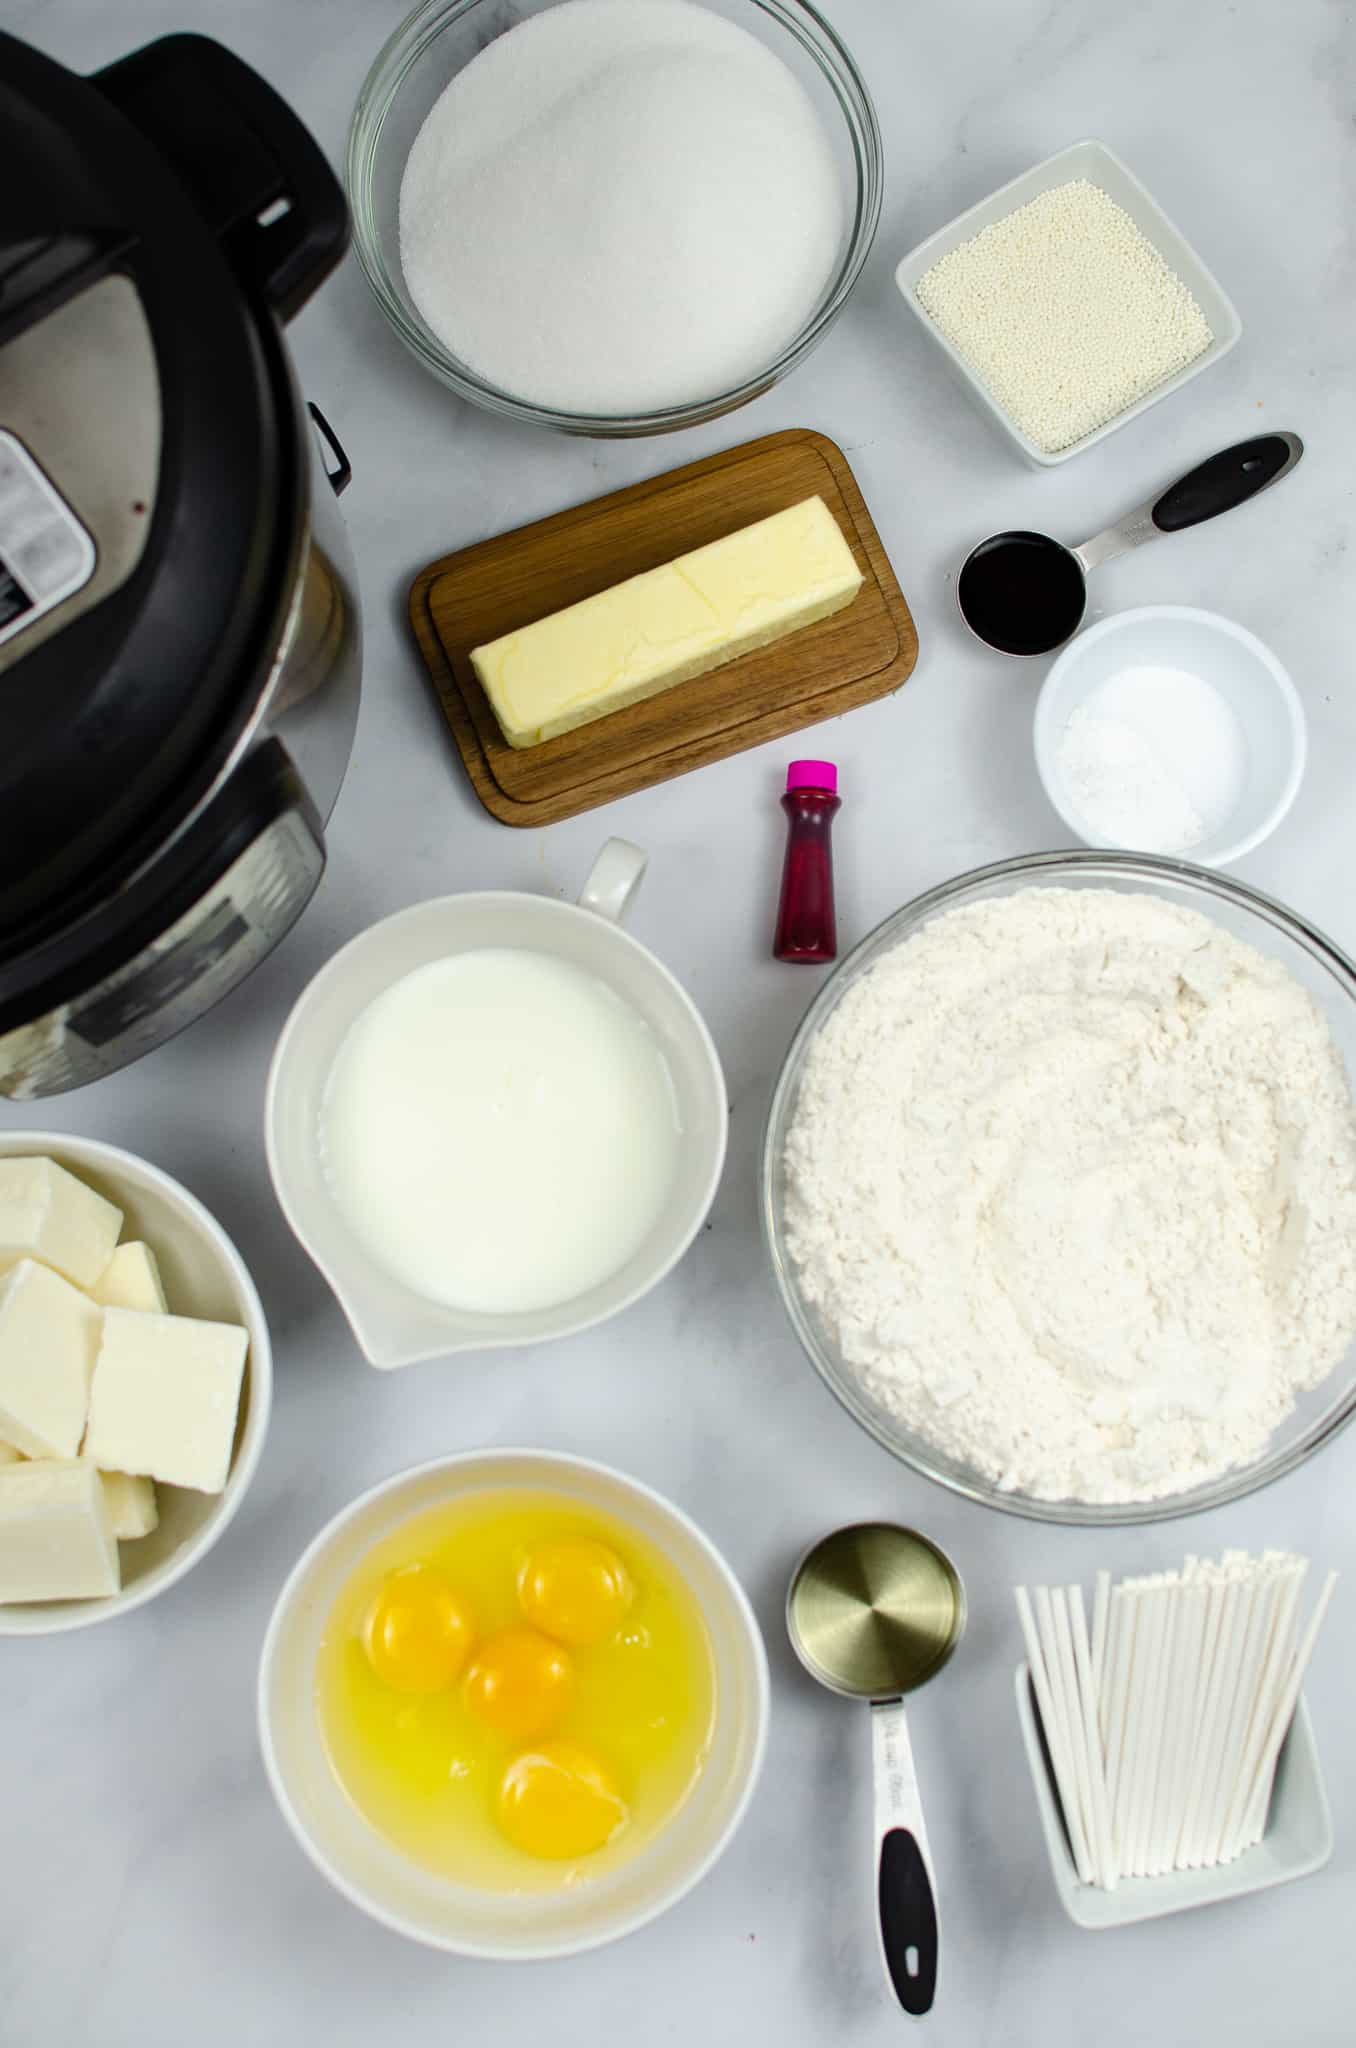 ingredients for cakepops in ingredient bowls on countertop